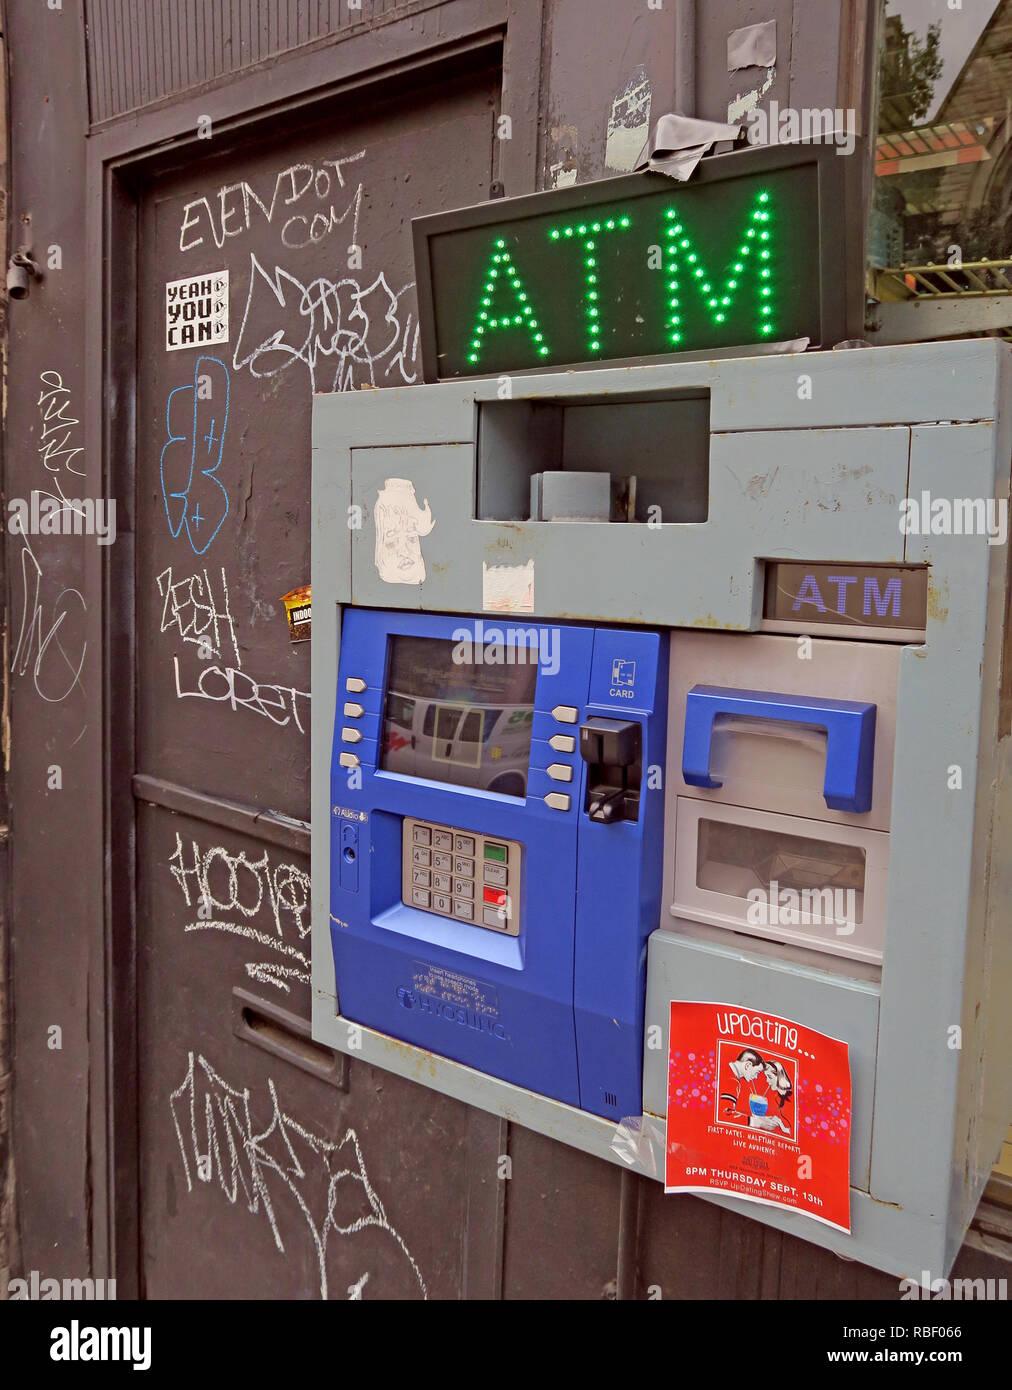 GoTonySmith,@HotpixUK,HotpixUK,NOHO NYC,NYC,New York City,New York St Marks Place,street,New York Street,USA,America,City Centre,city,centre,center,city center,East Village,Eastvillage,ATM,Cash Machine,AutoTeller,Auto Teller,New York Travel Tourism,US Street ATM,Hyosung ATM,Saint Marks Place,Manhattan,NY,US,Street ATM,Hyosung,St Marks Place,urbn,automation,automated,dollars